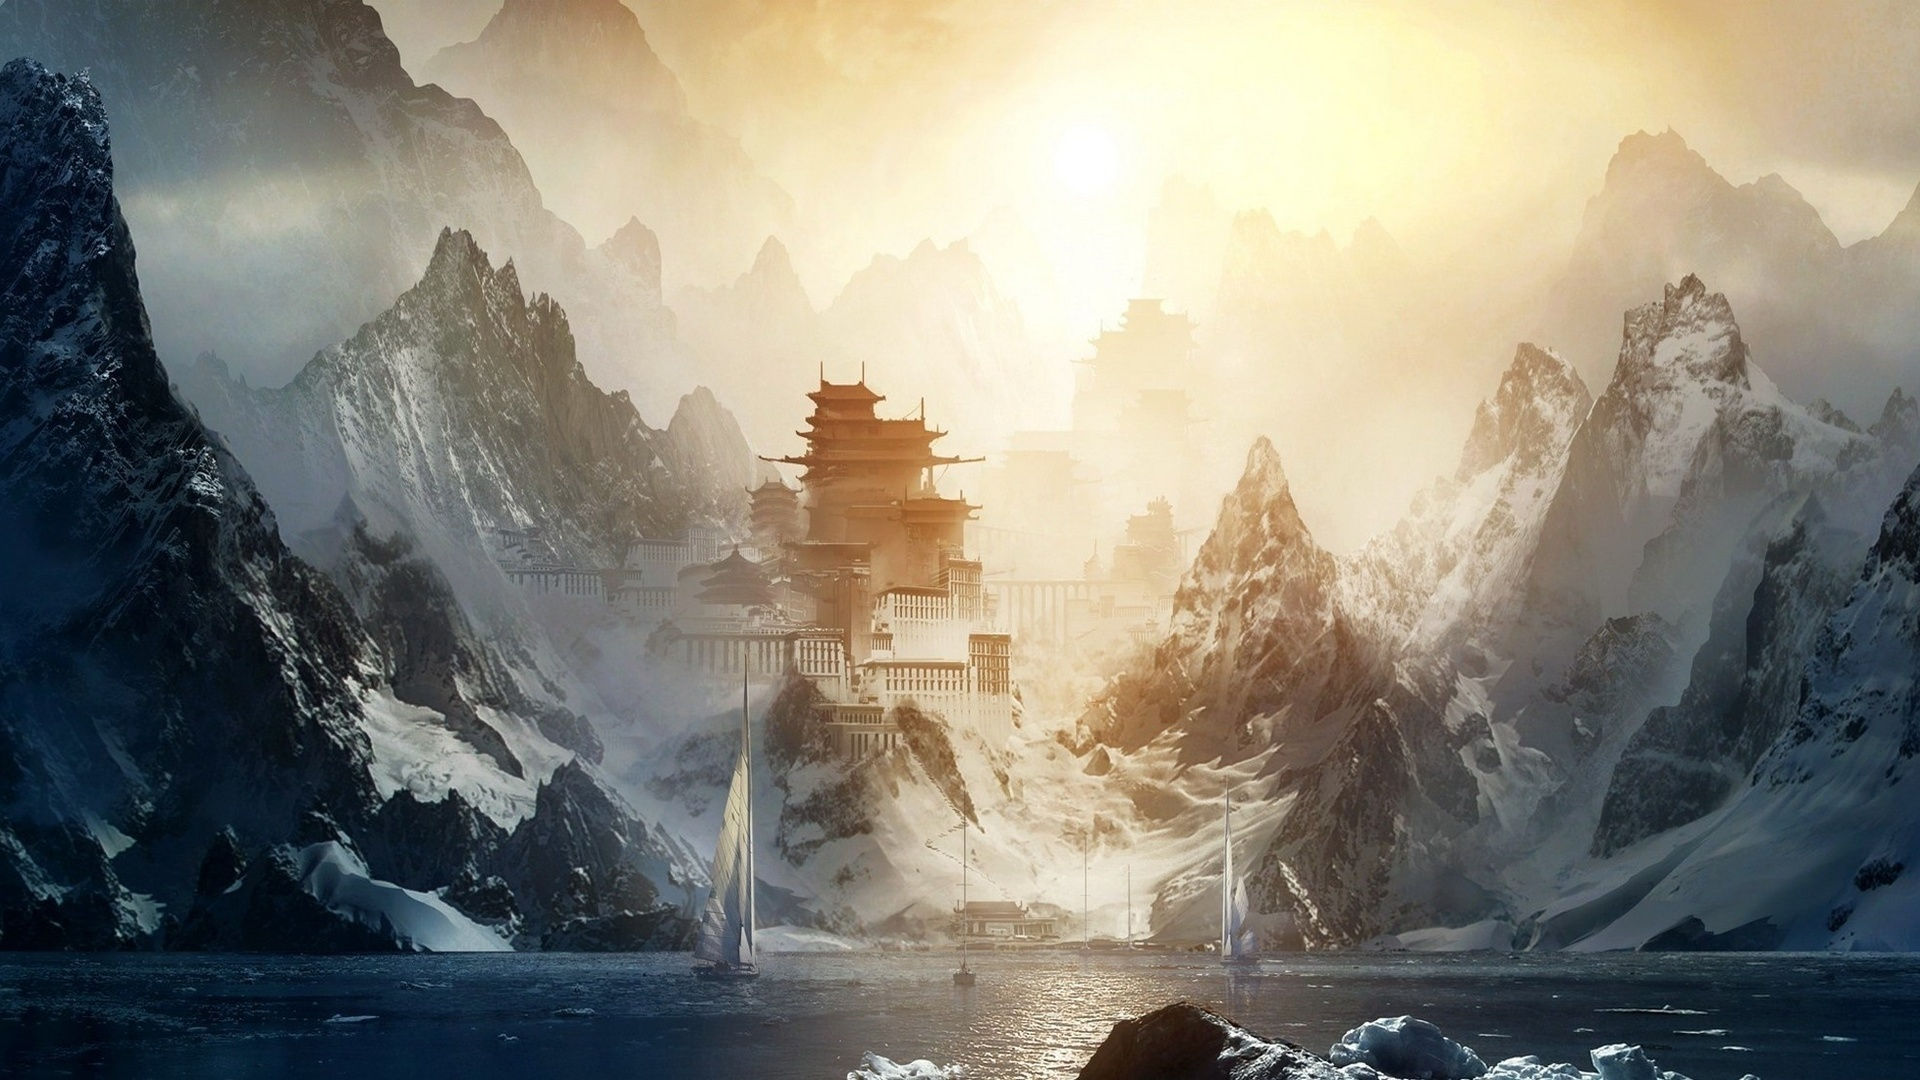 Beautiful Wallpaper Mountain Fantasy - 459655  Pic_45430.jpg